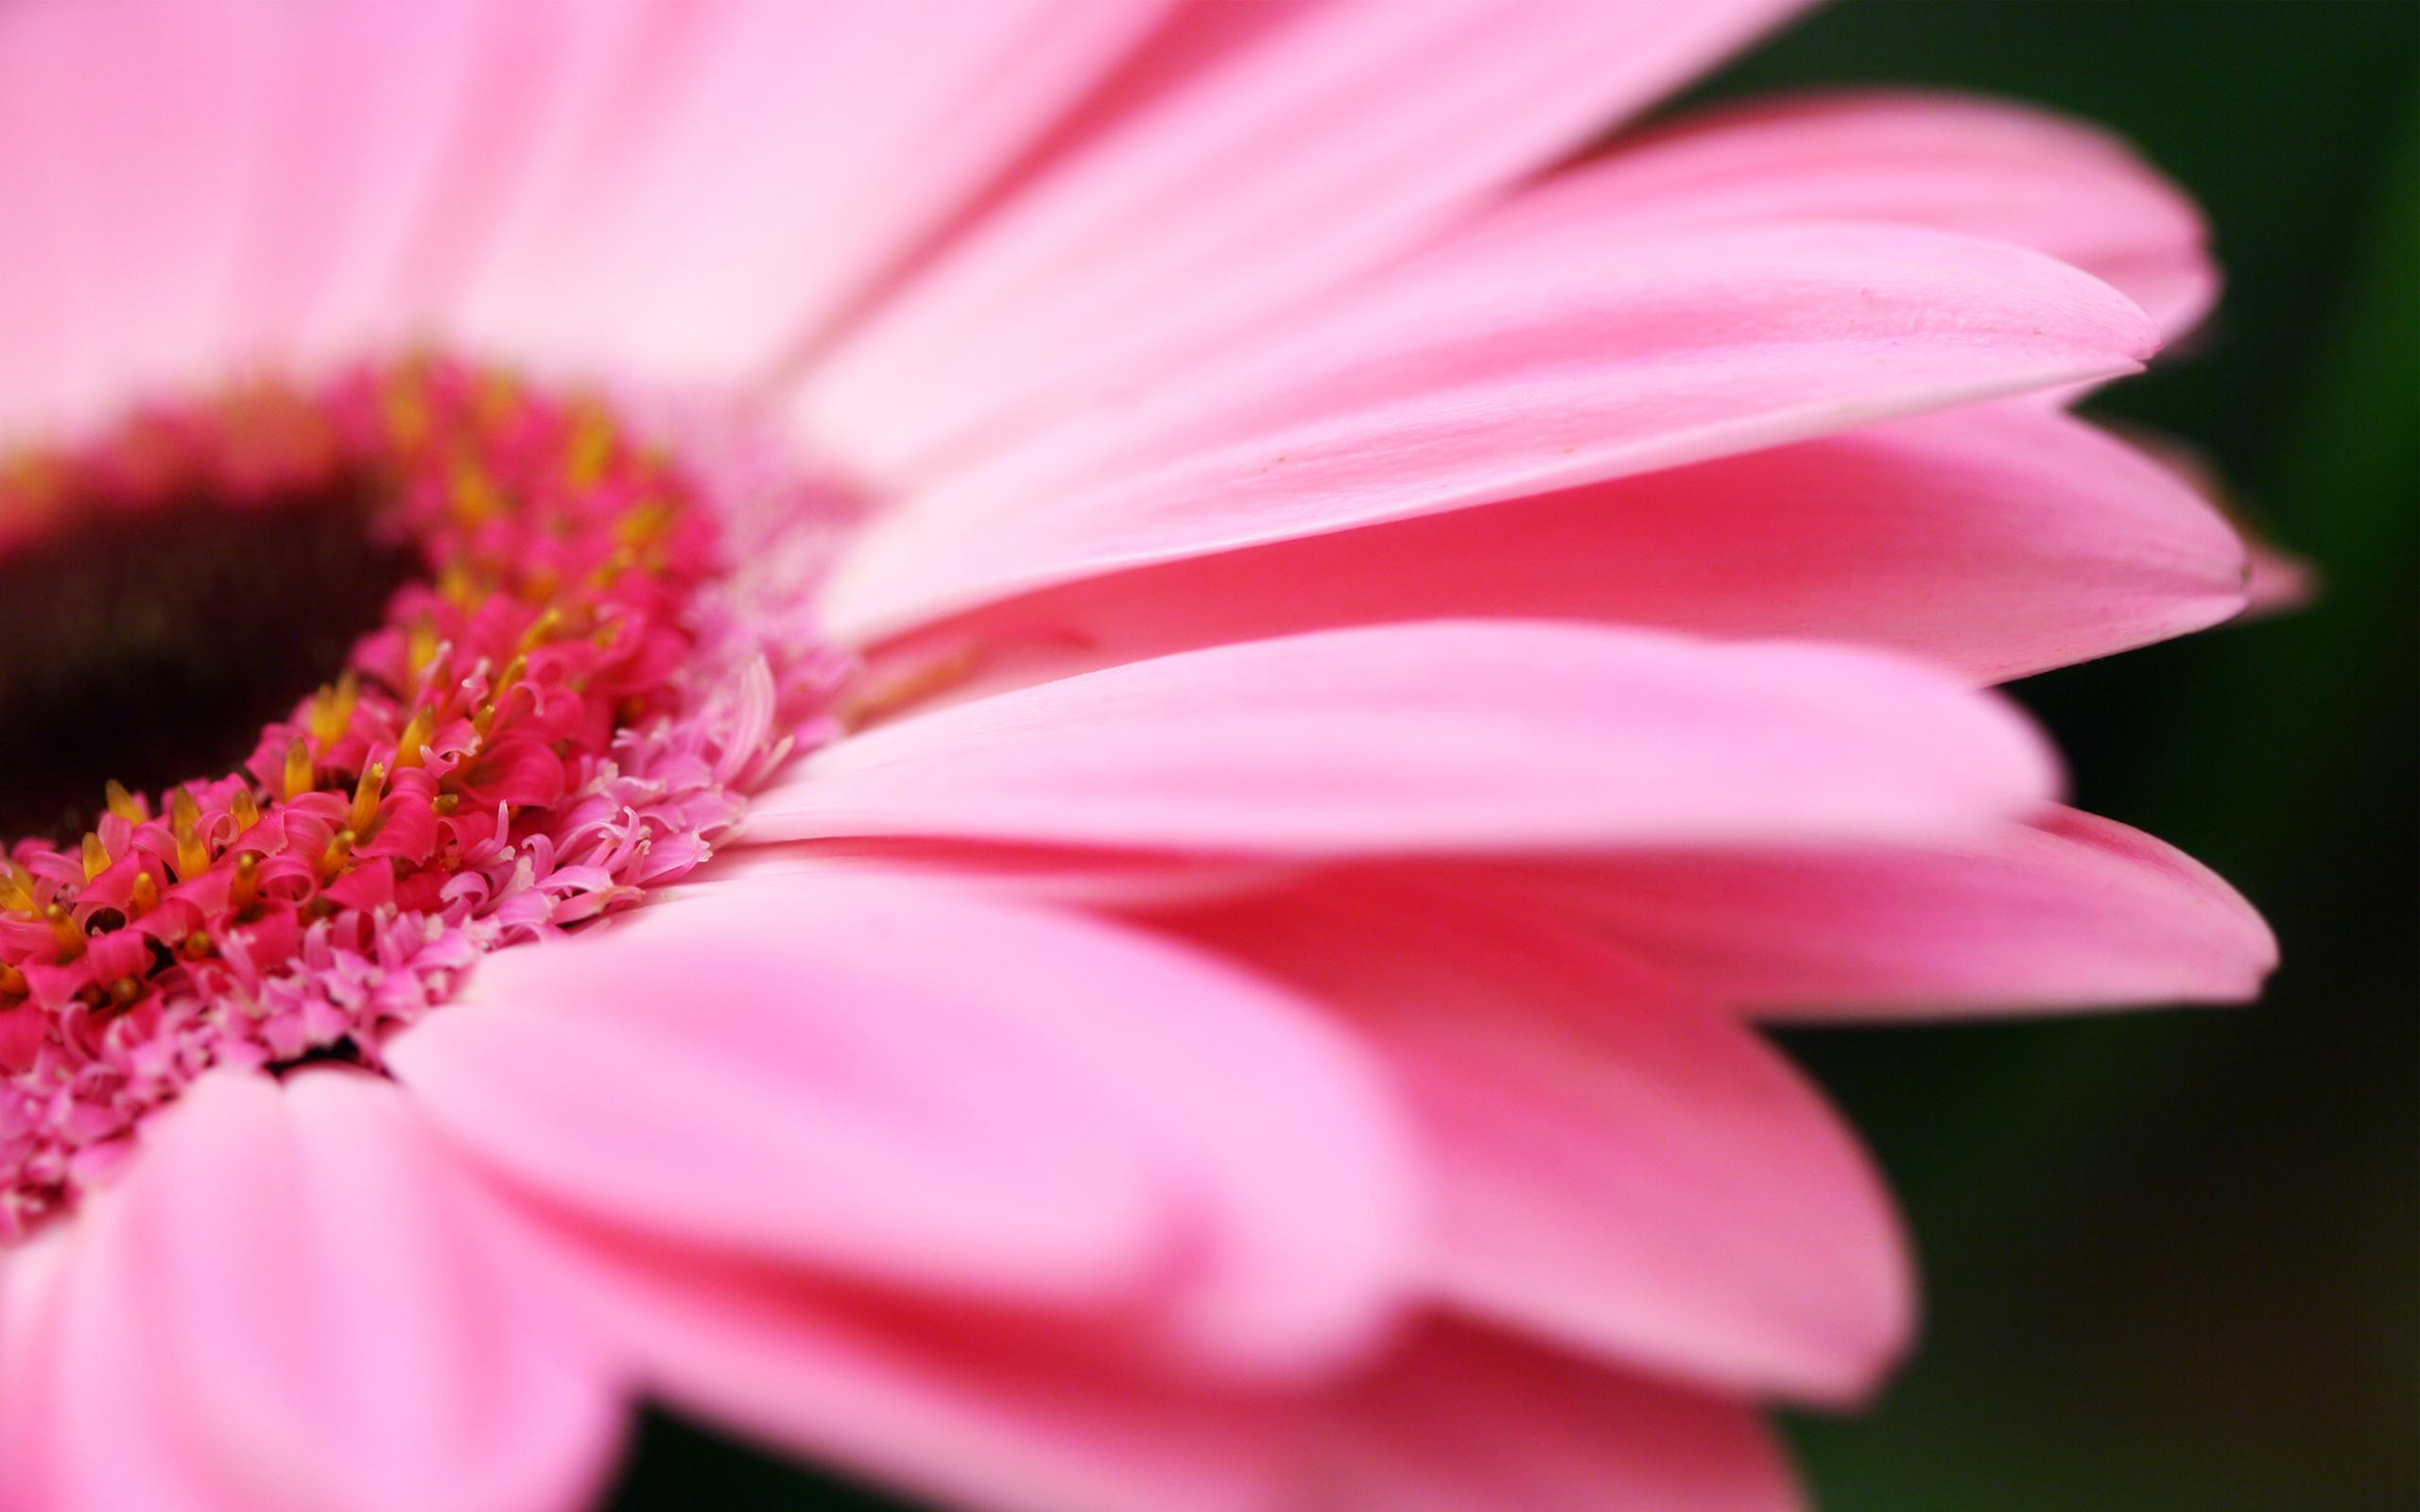 floral wallpaper pink